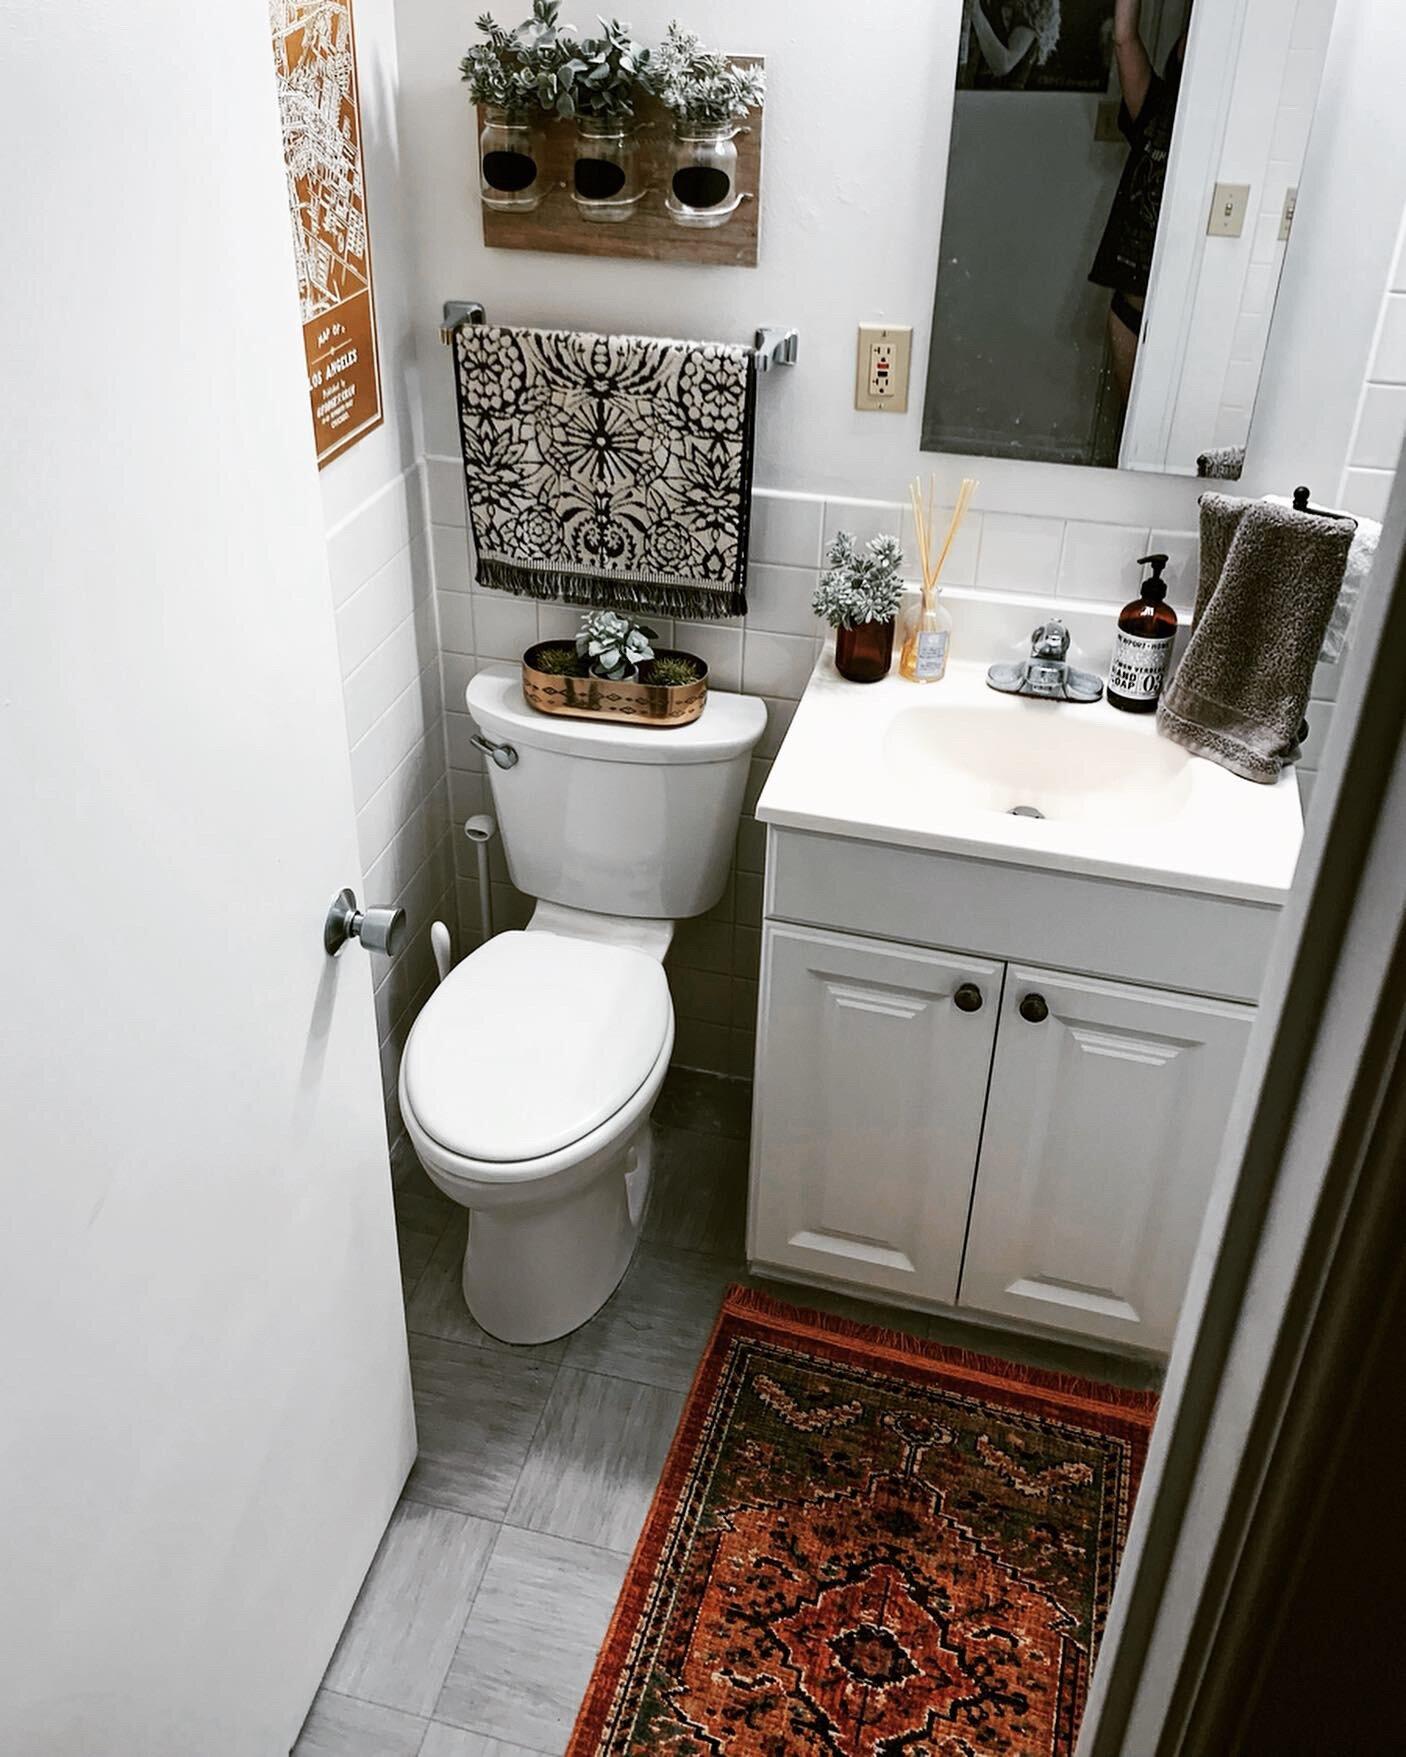 Small Apartment Bathroom Ideas: How to Make a Tiny ... on Apartment Bathroom Ideas  id=53668